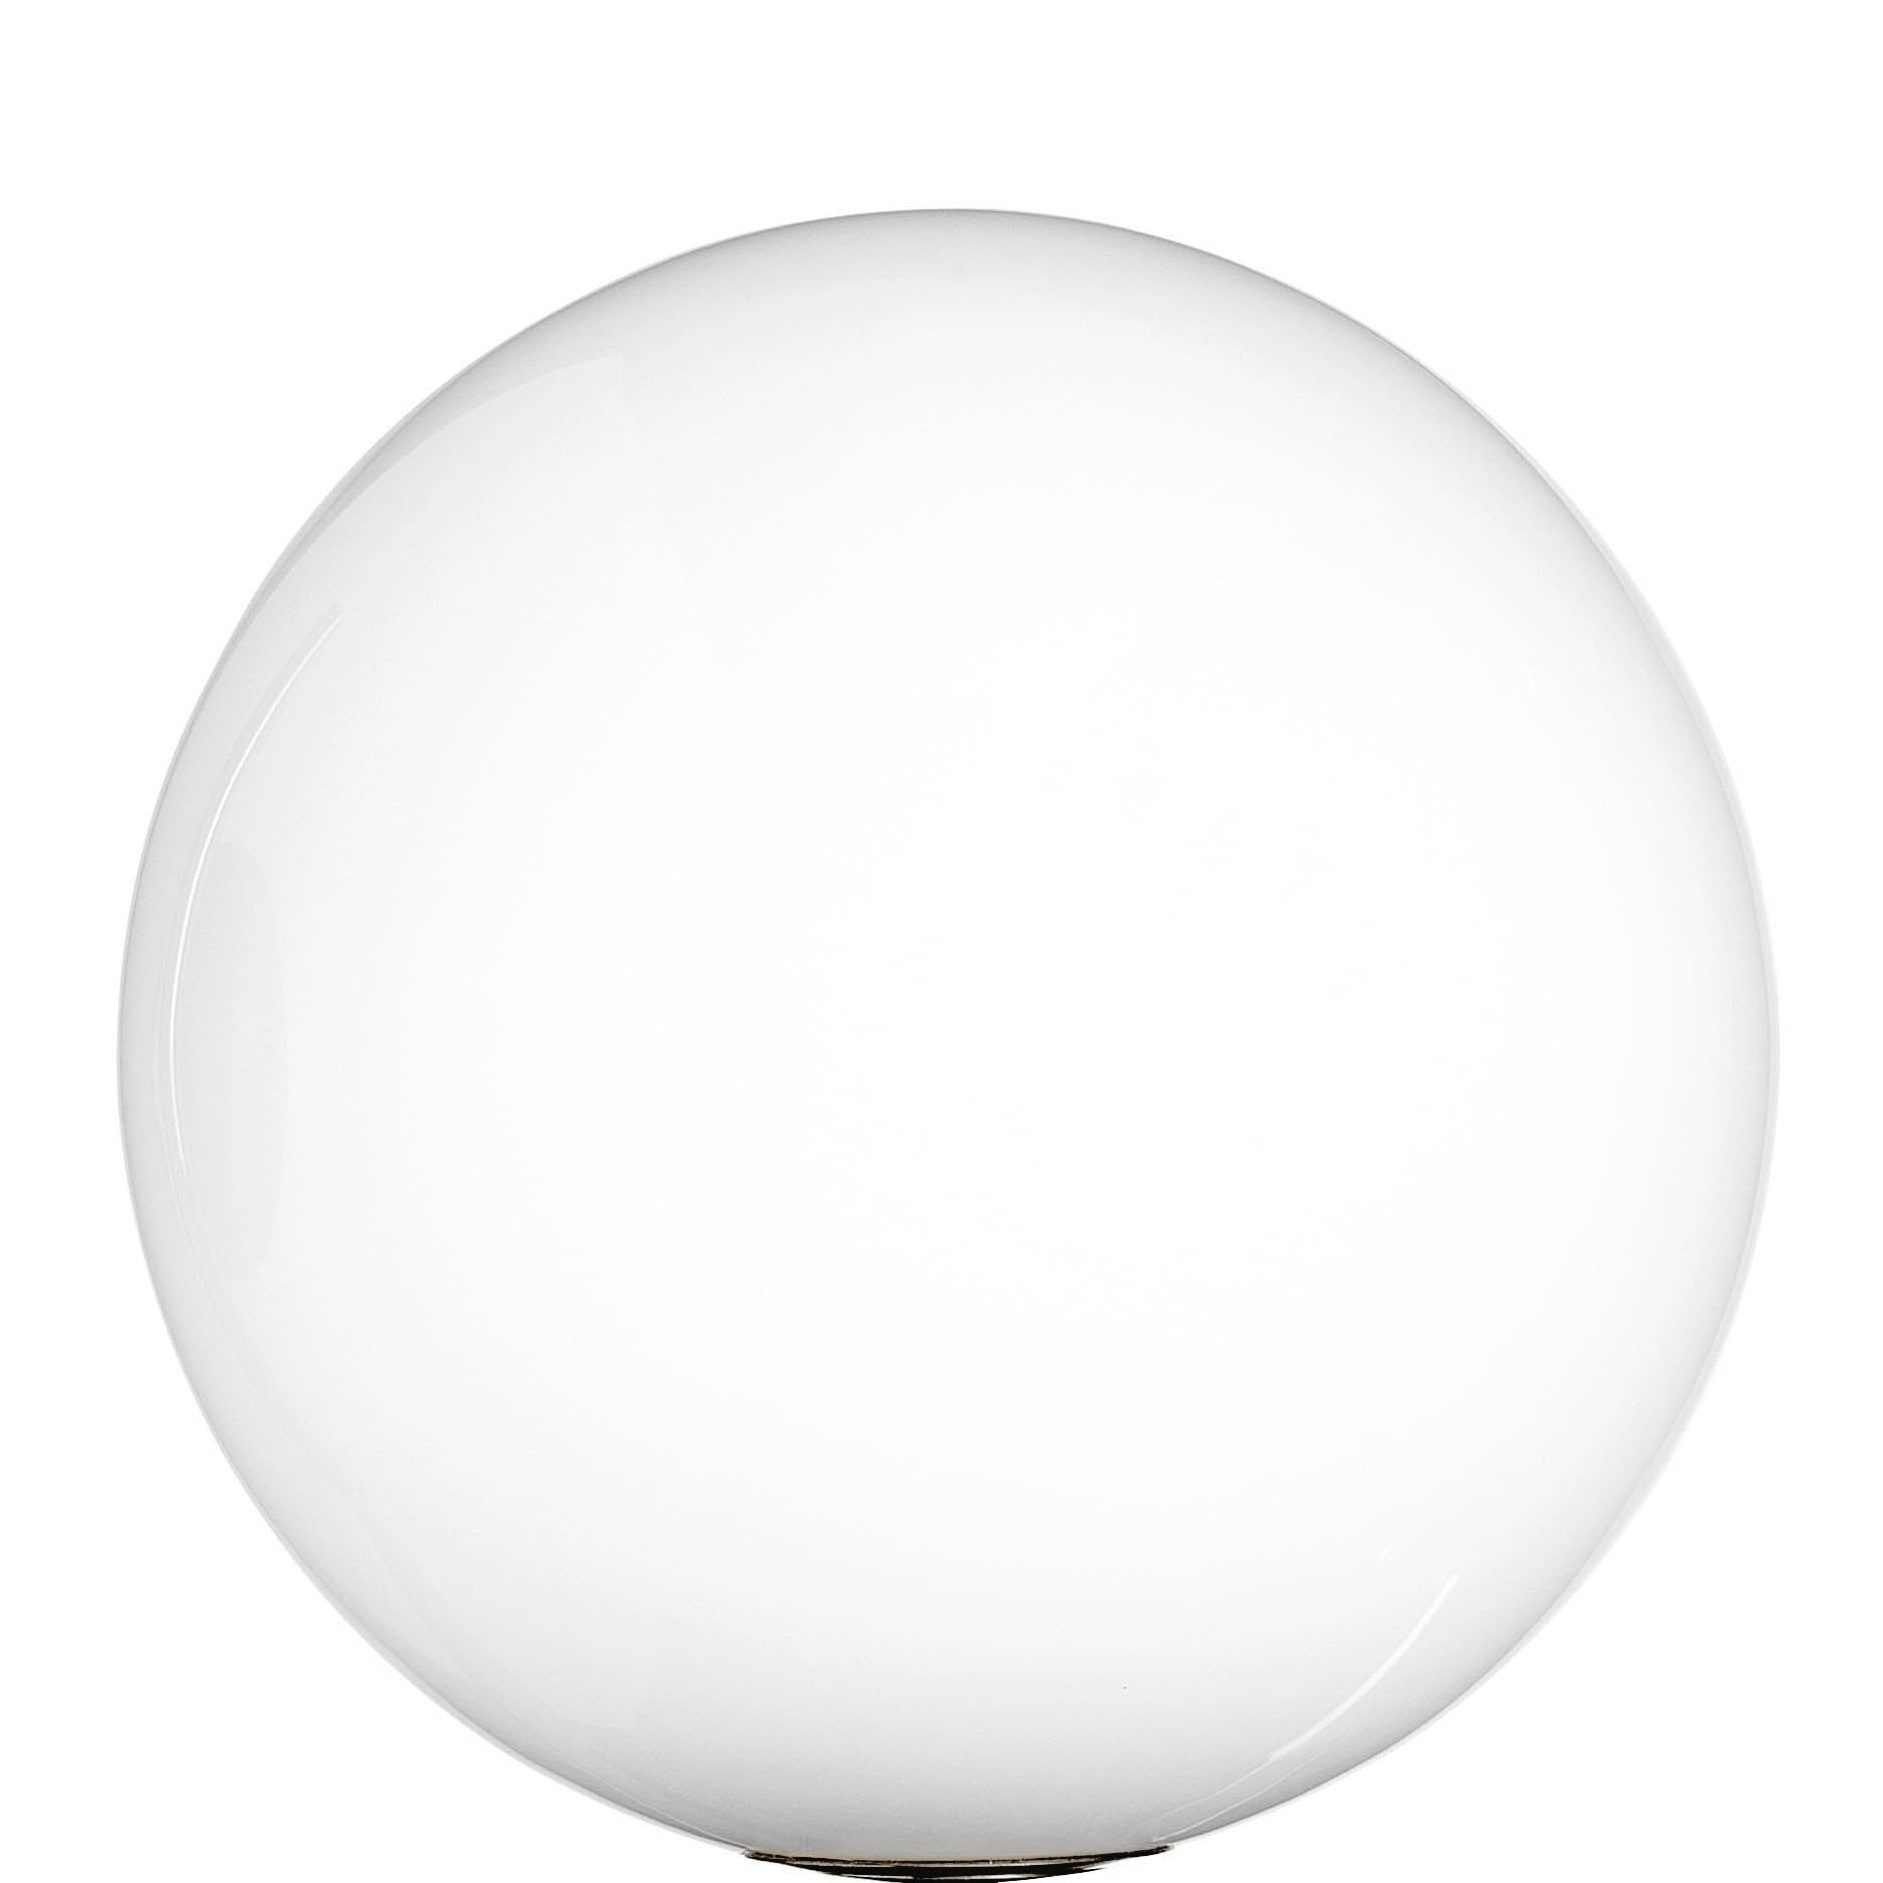 IC Light 1 reservglas krom